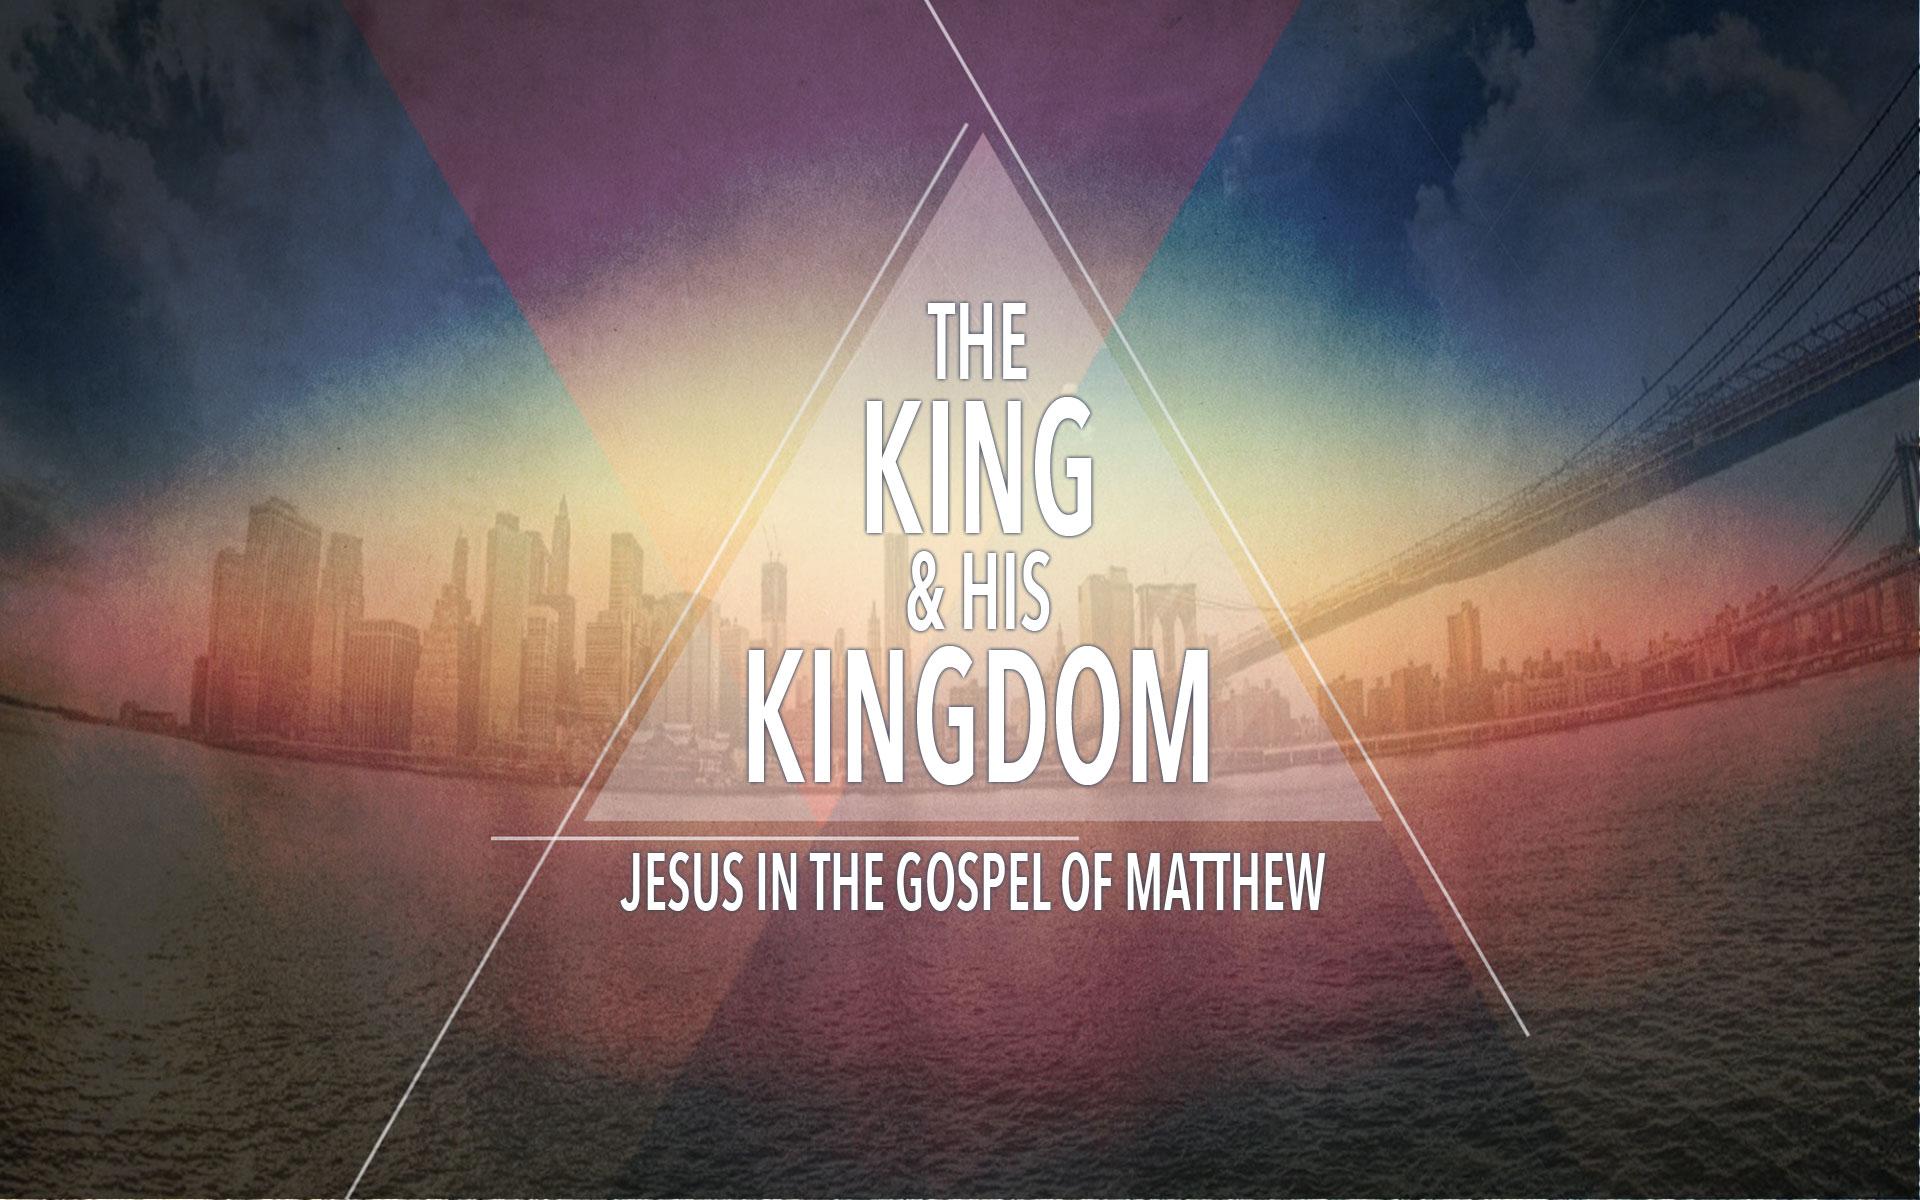 king&kingdomsermonimage.jpg